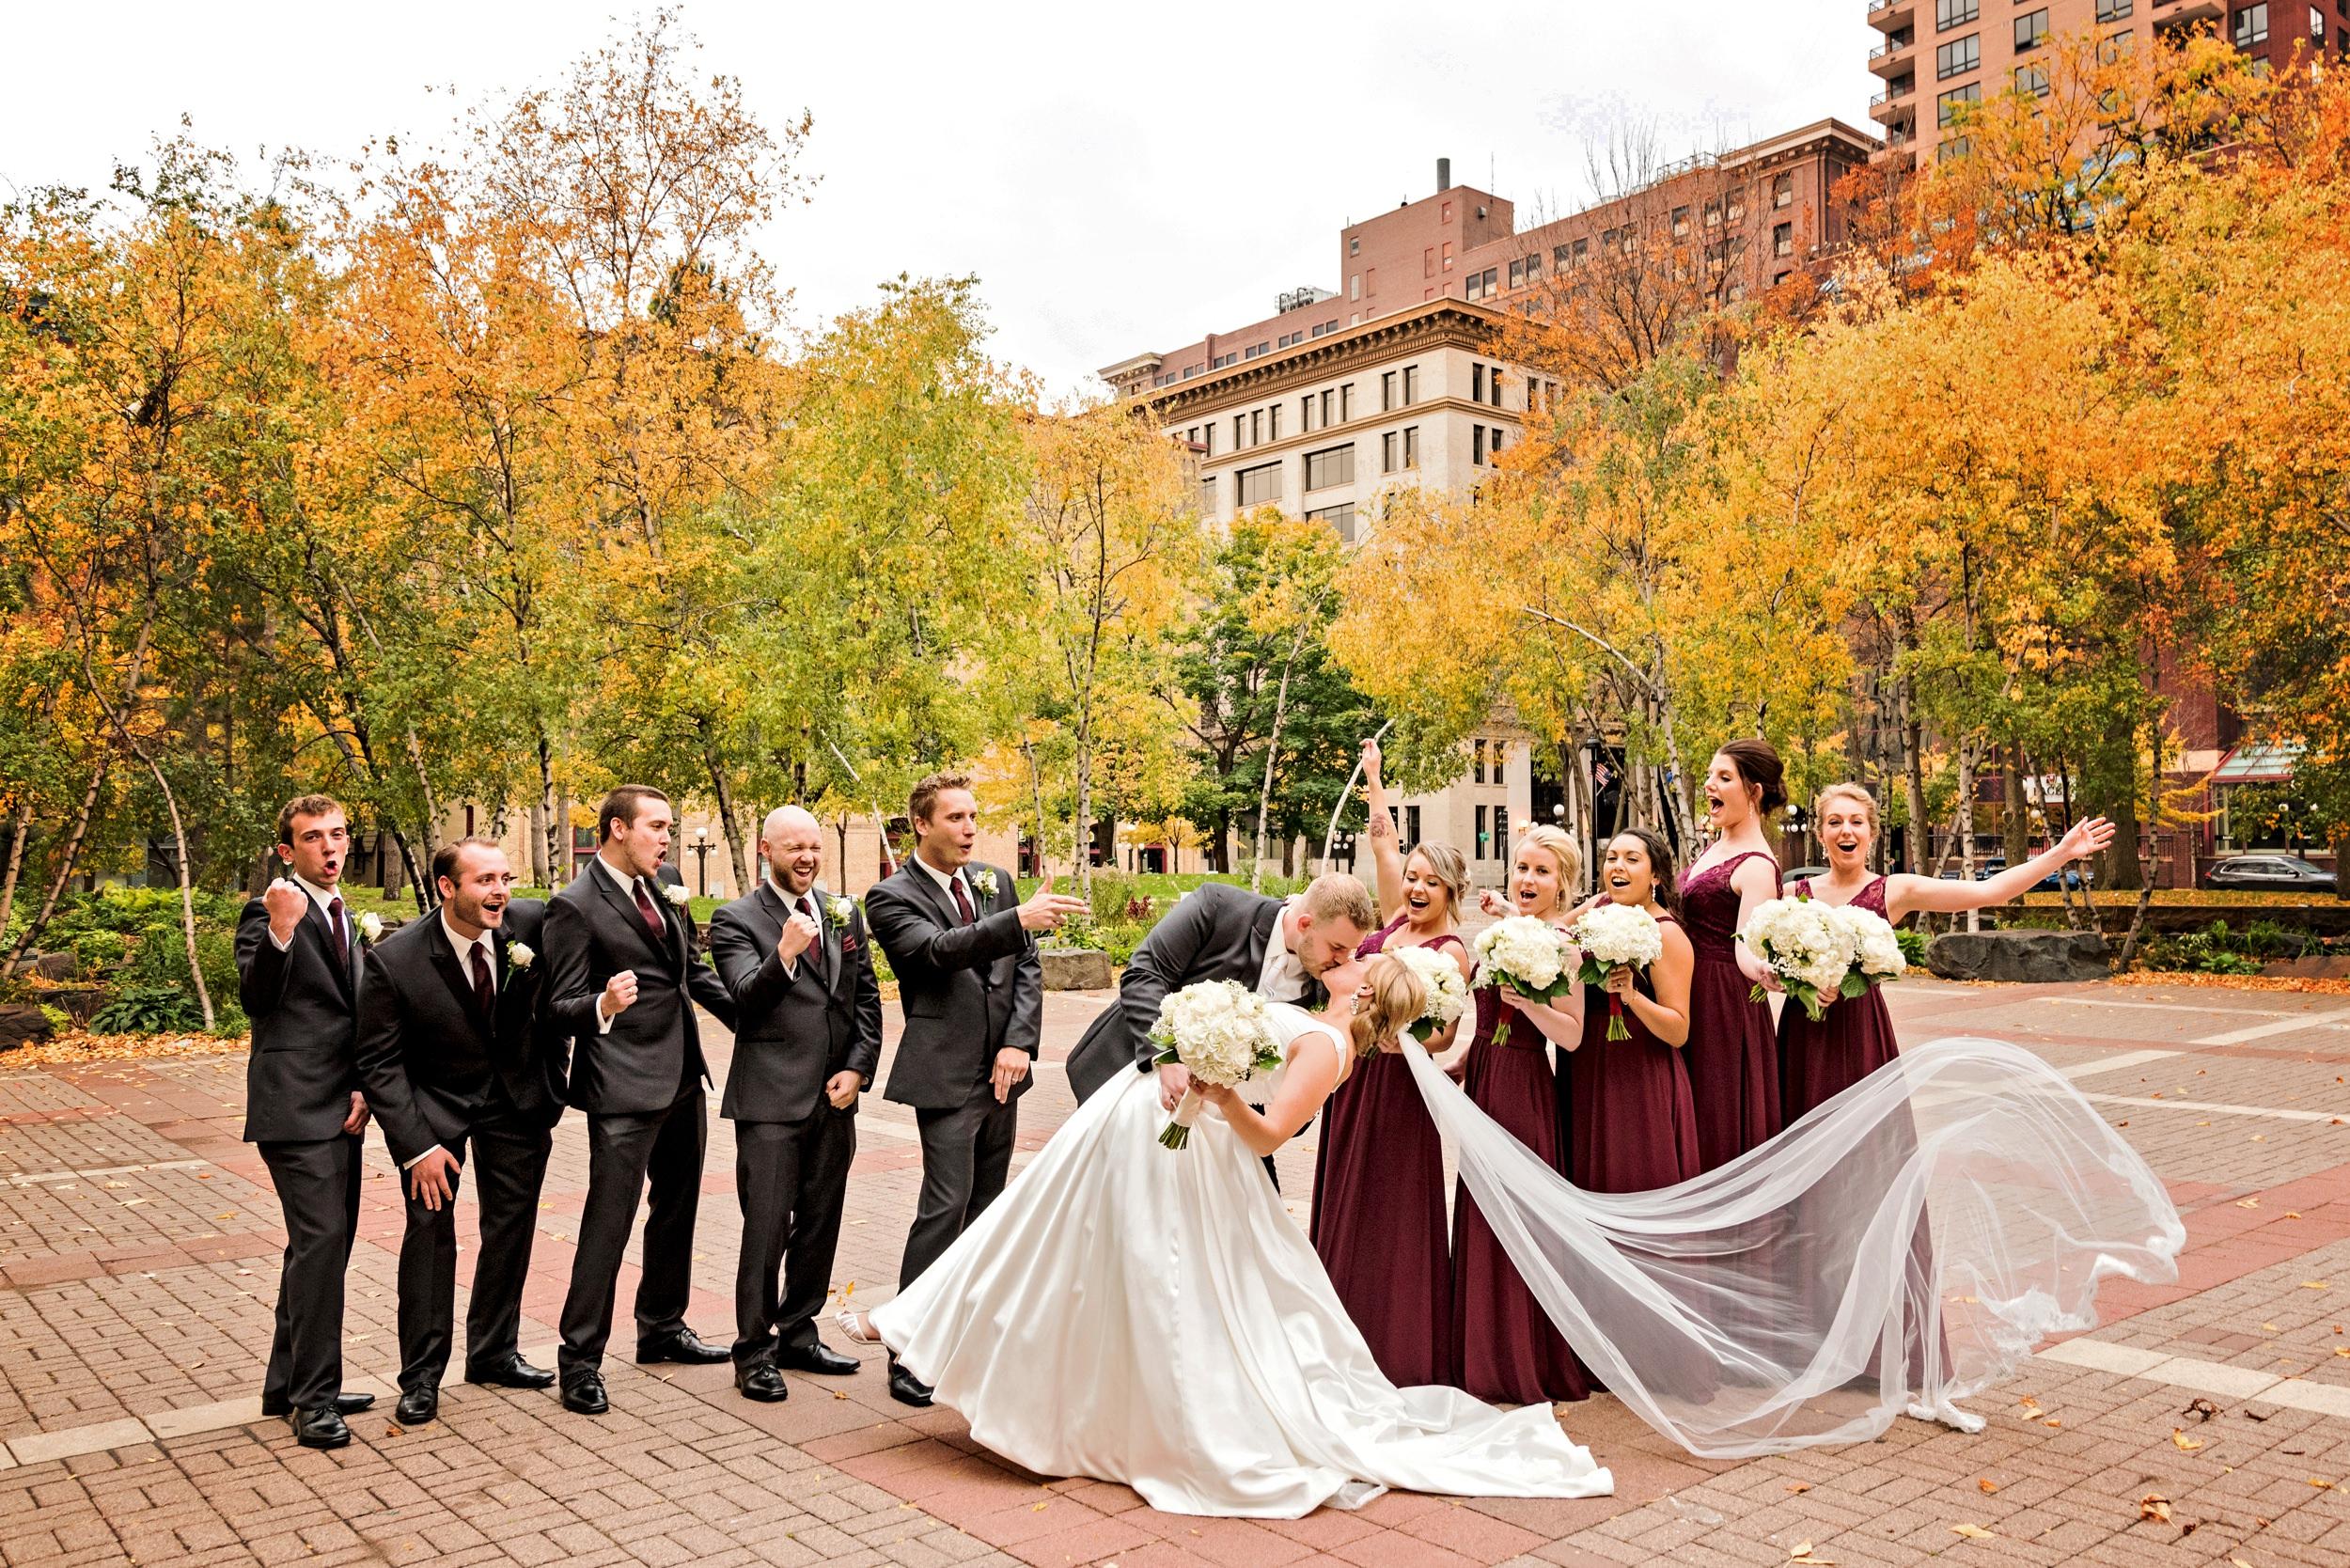 2018-Real-Wedding-Megan-Brenden-Rotella-Photography_0484.jpg